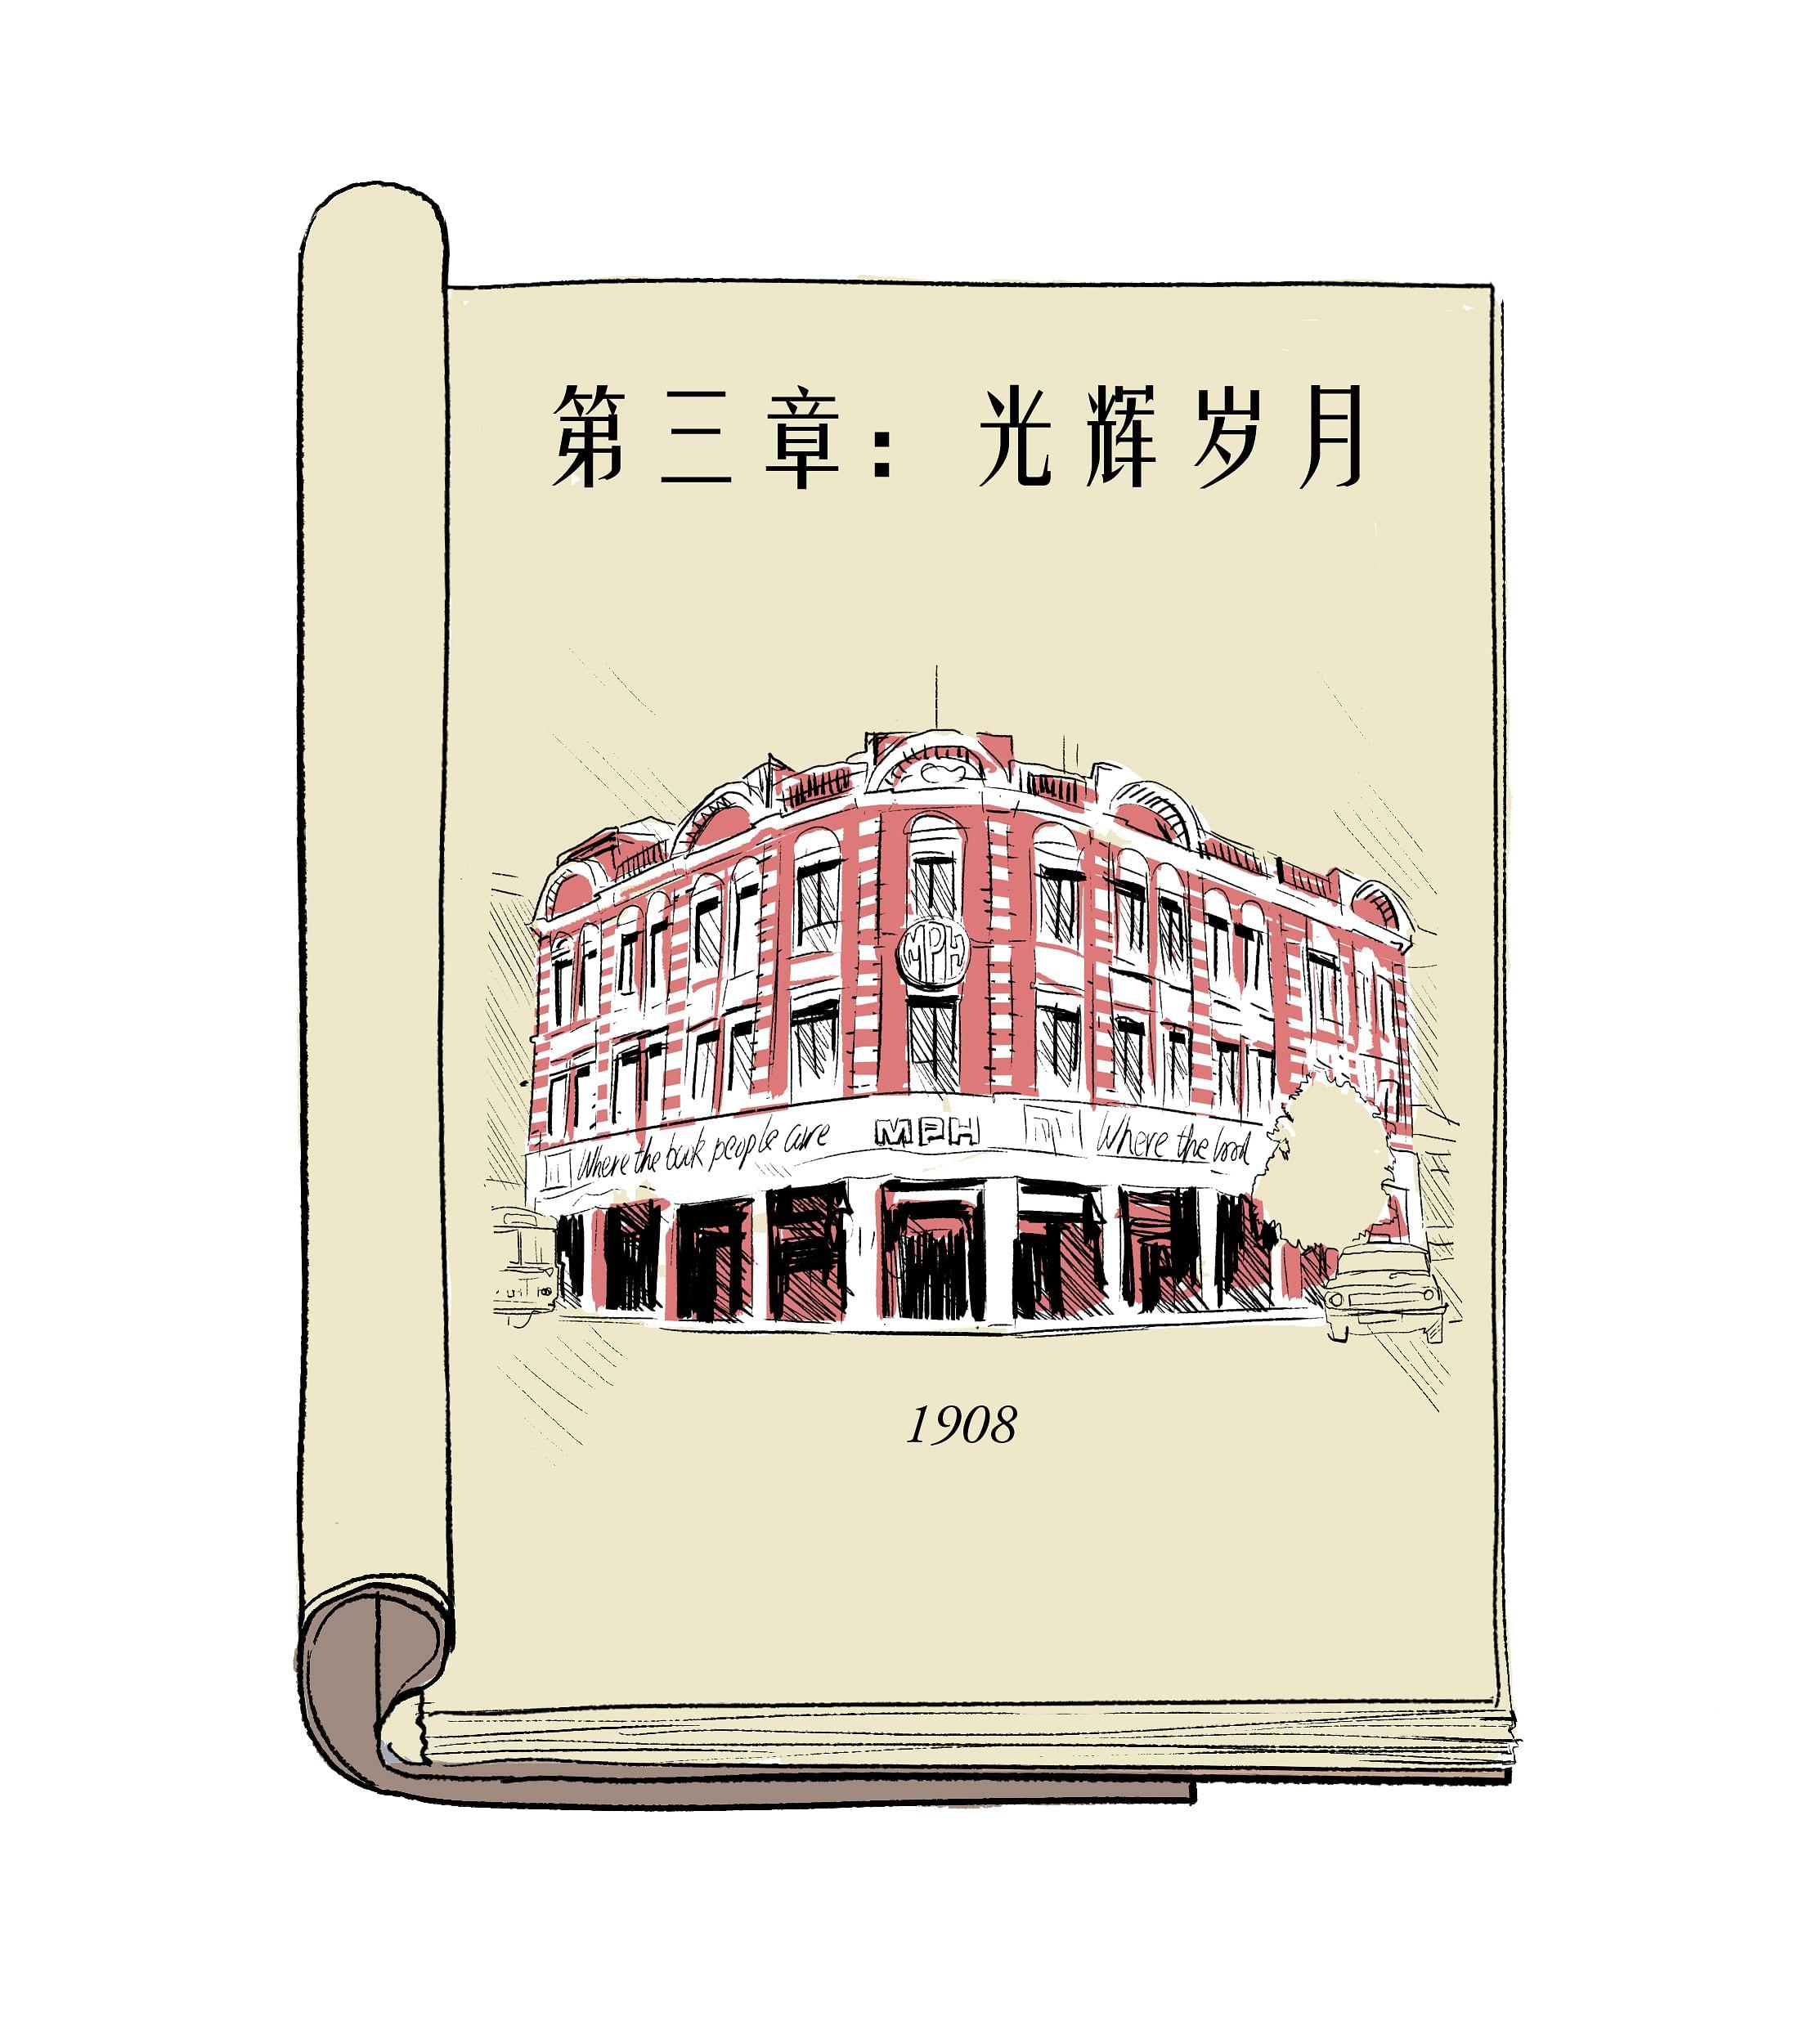 20190712_singapore_mph-bookstore-closing-04-mobile.jpg